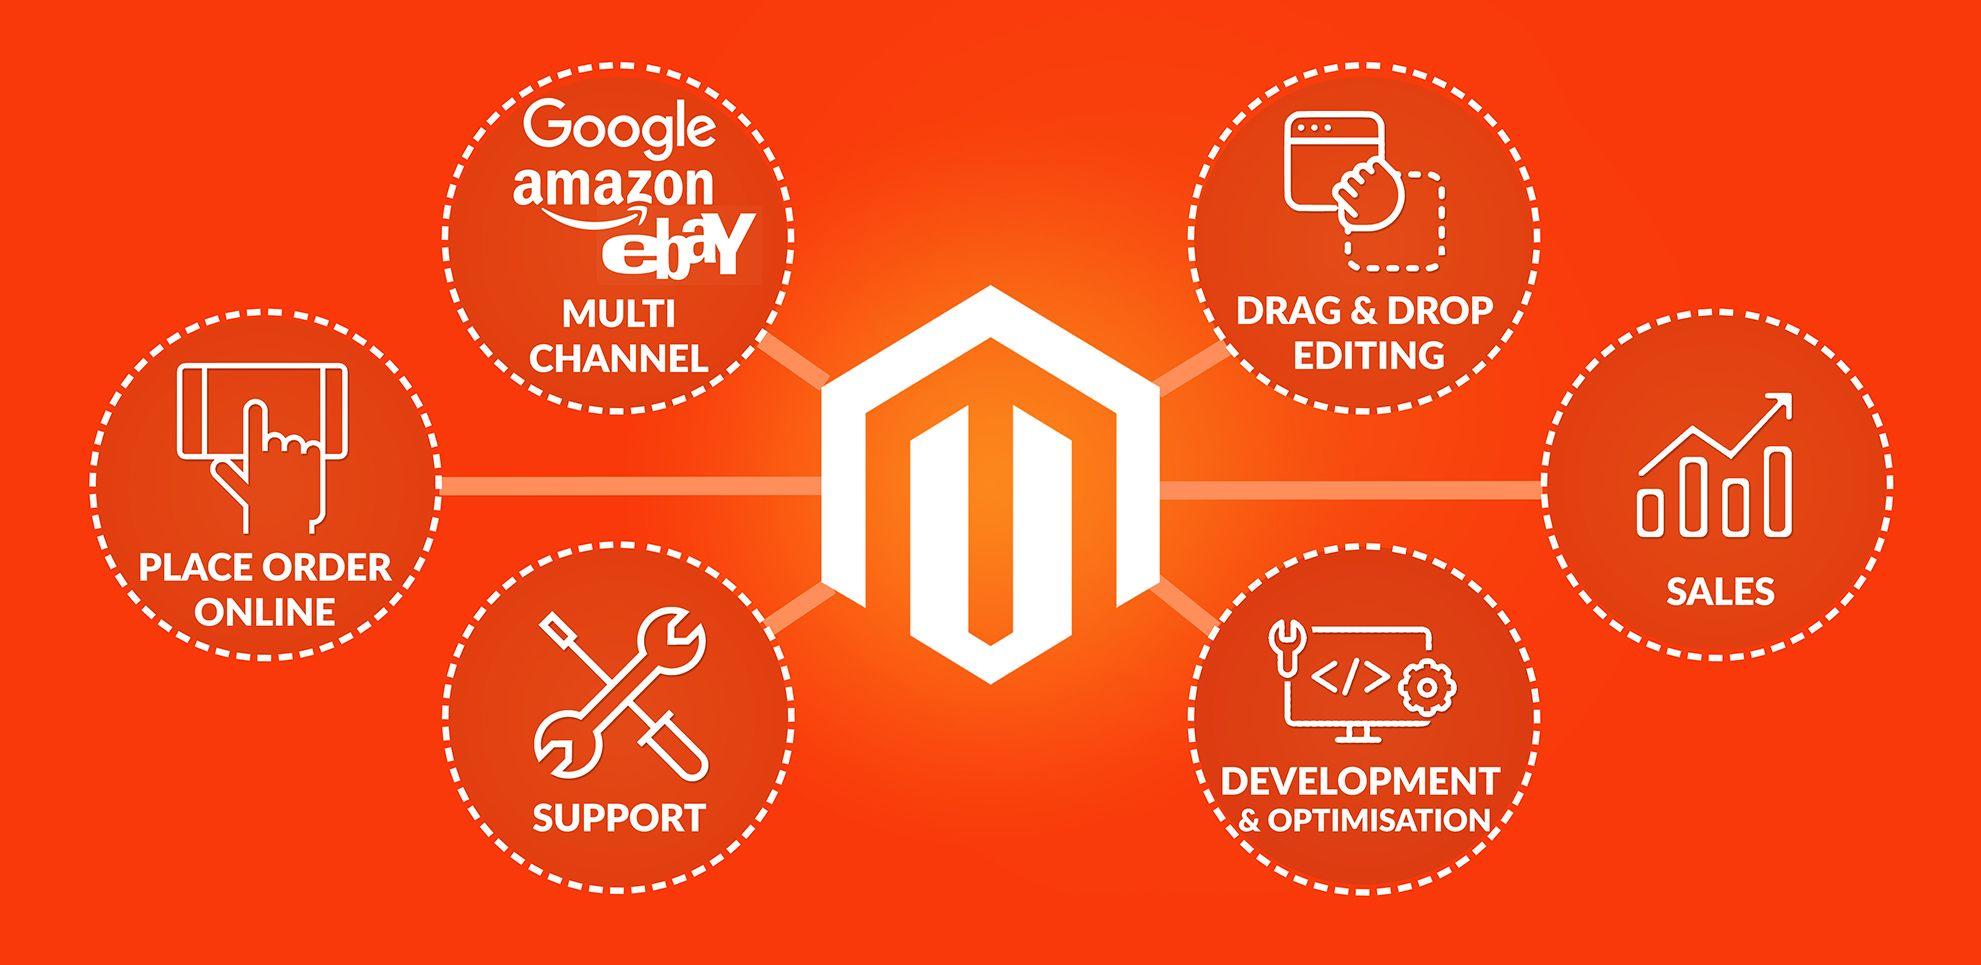 magento dublin ecommerce web design dublin